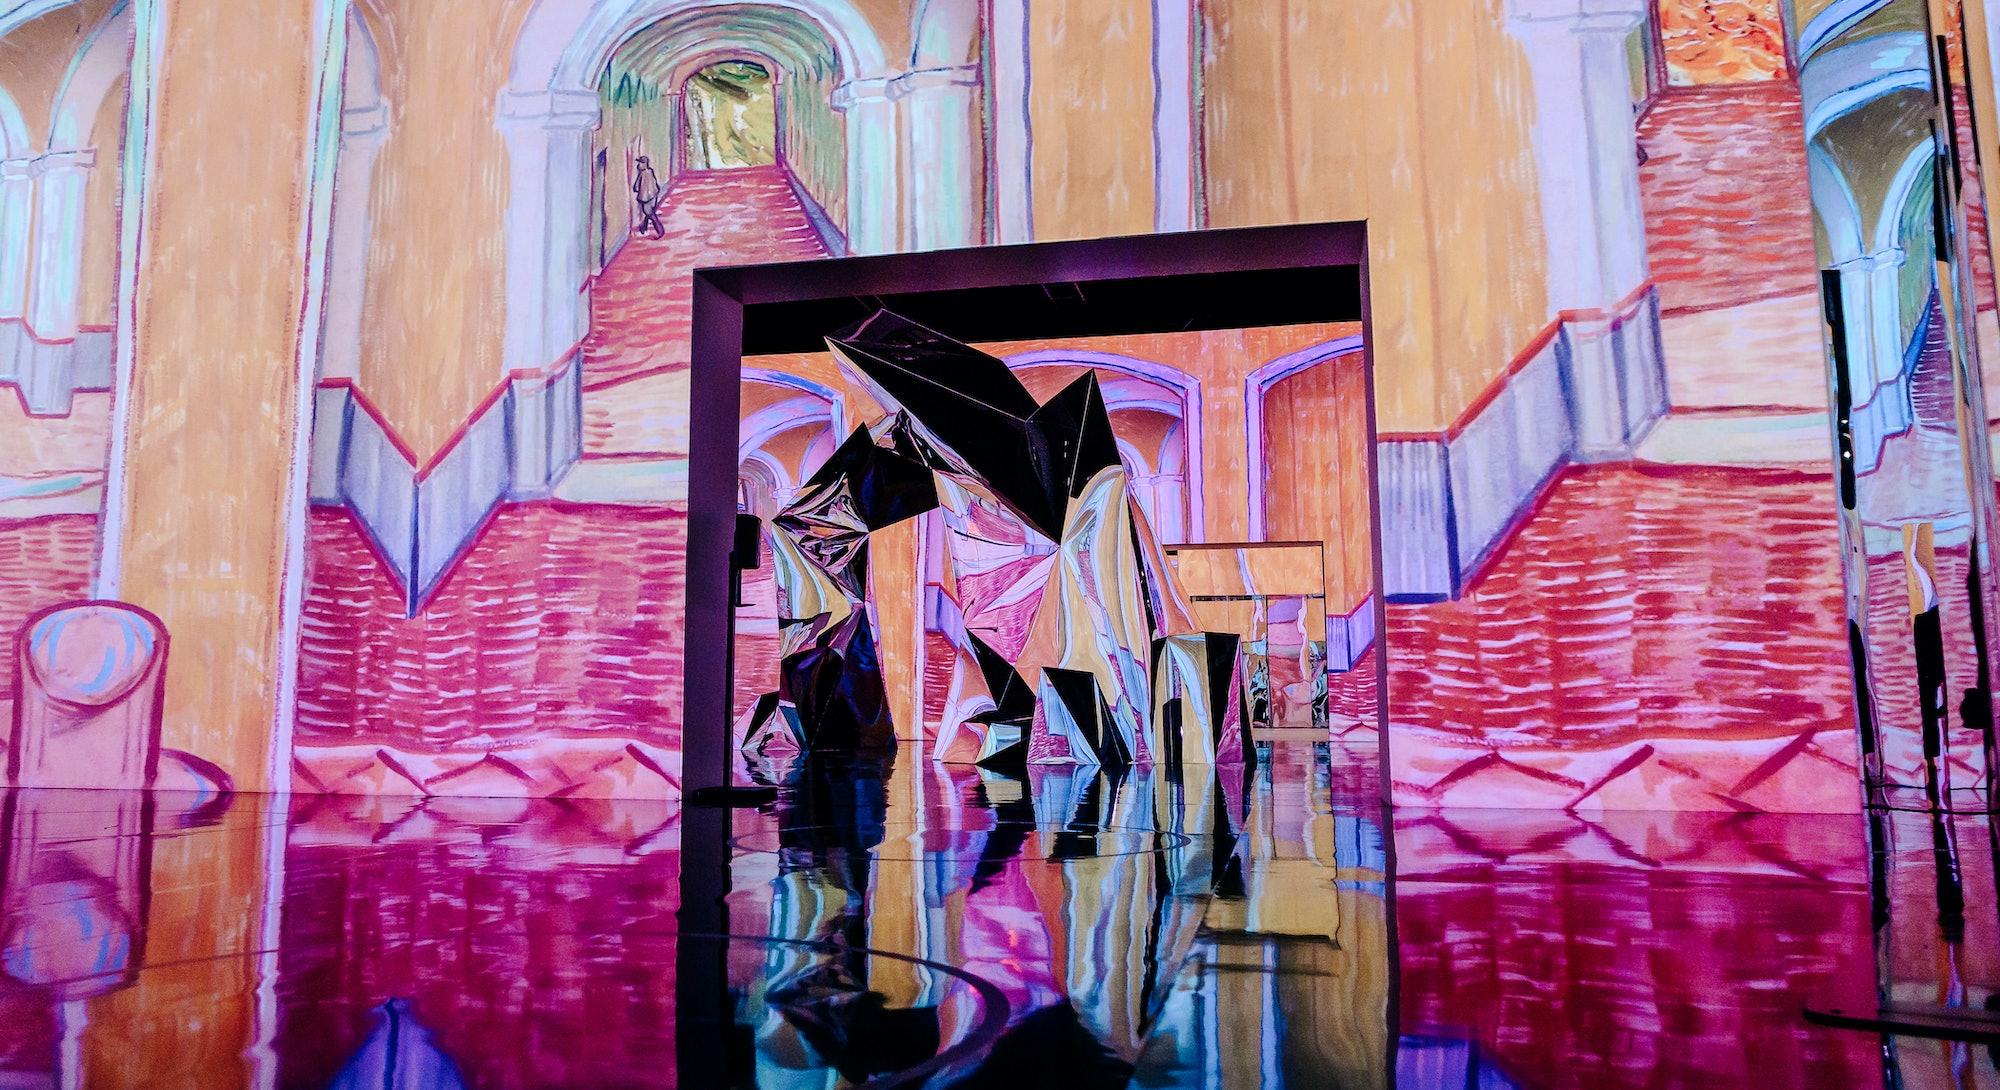 The team behind New York's Van Gogh exhibition includes Italian film producer Massimiliano Siccardi ...